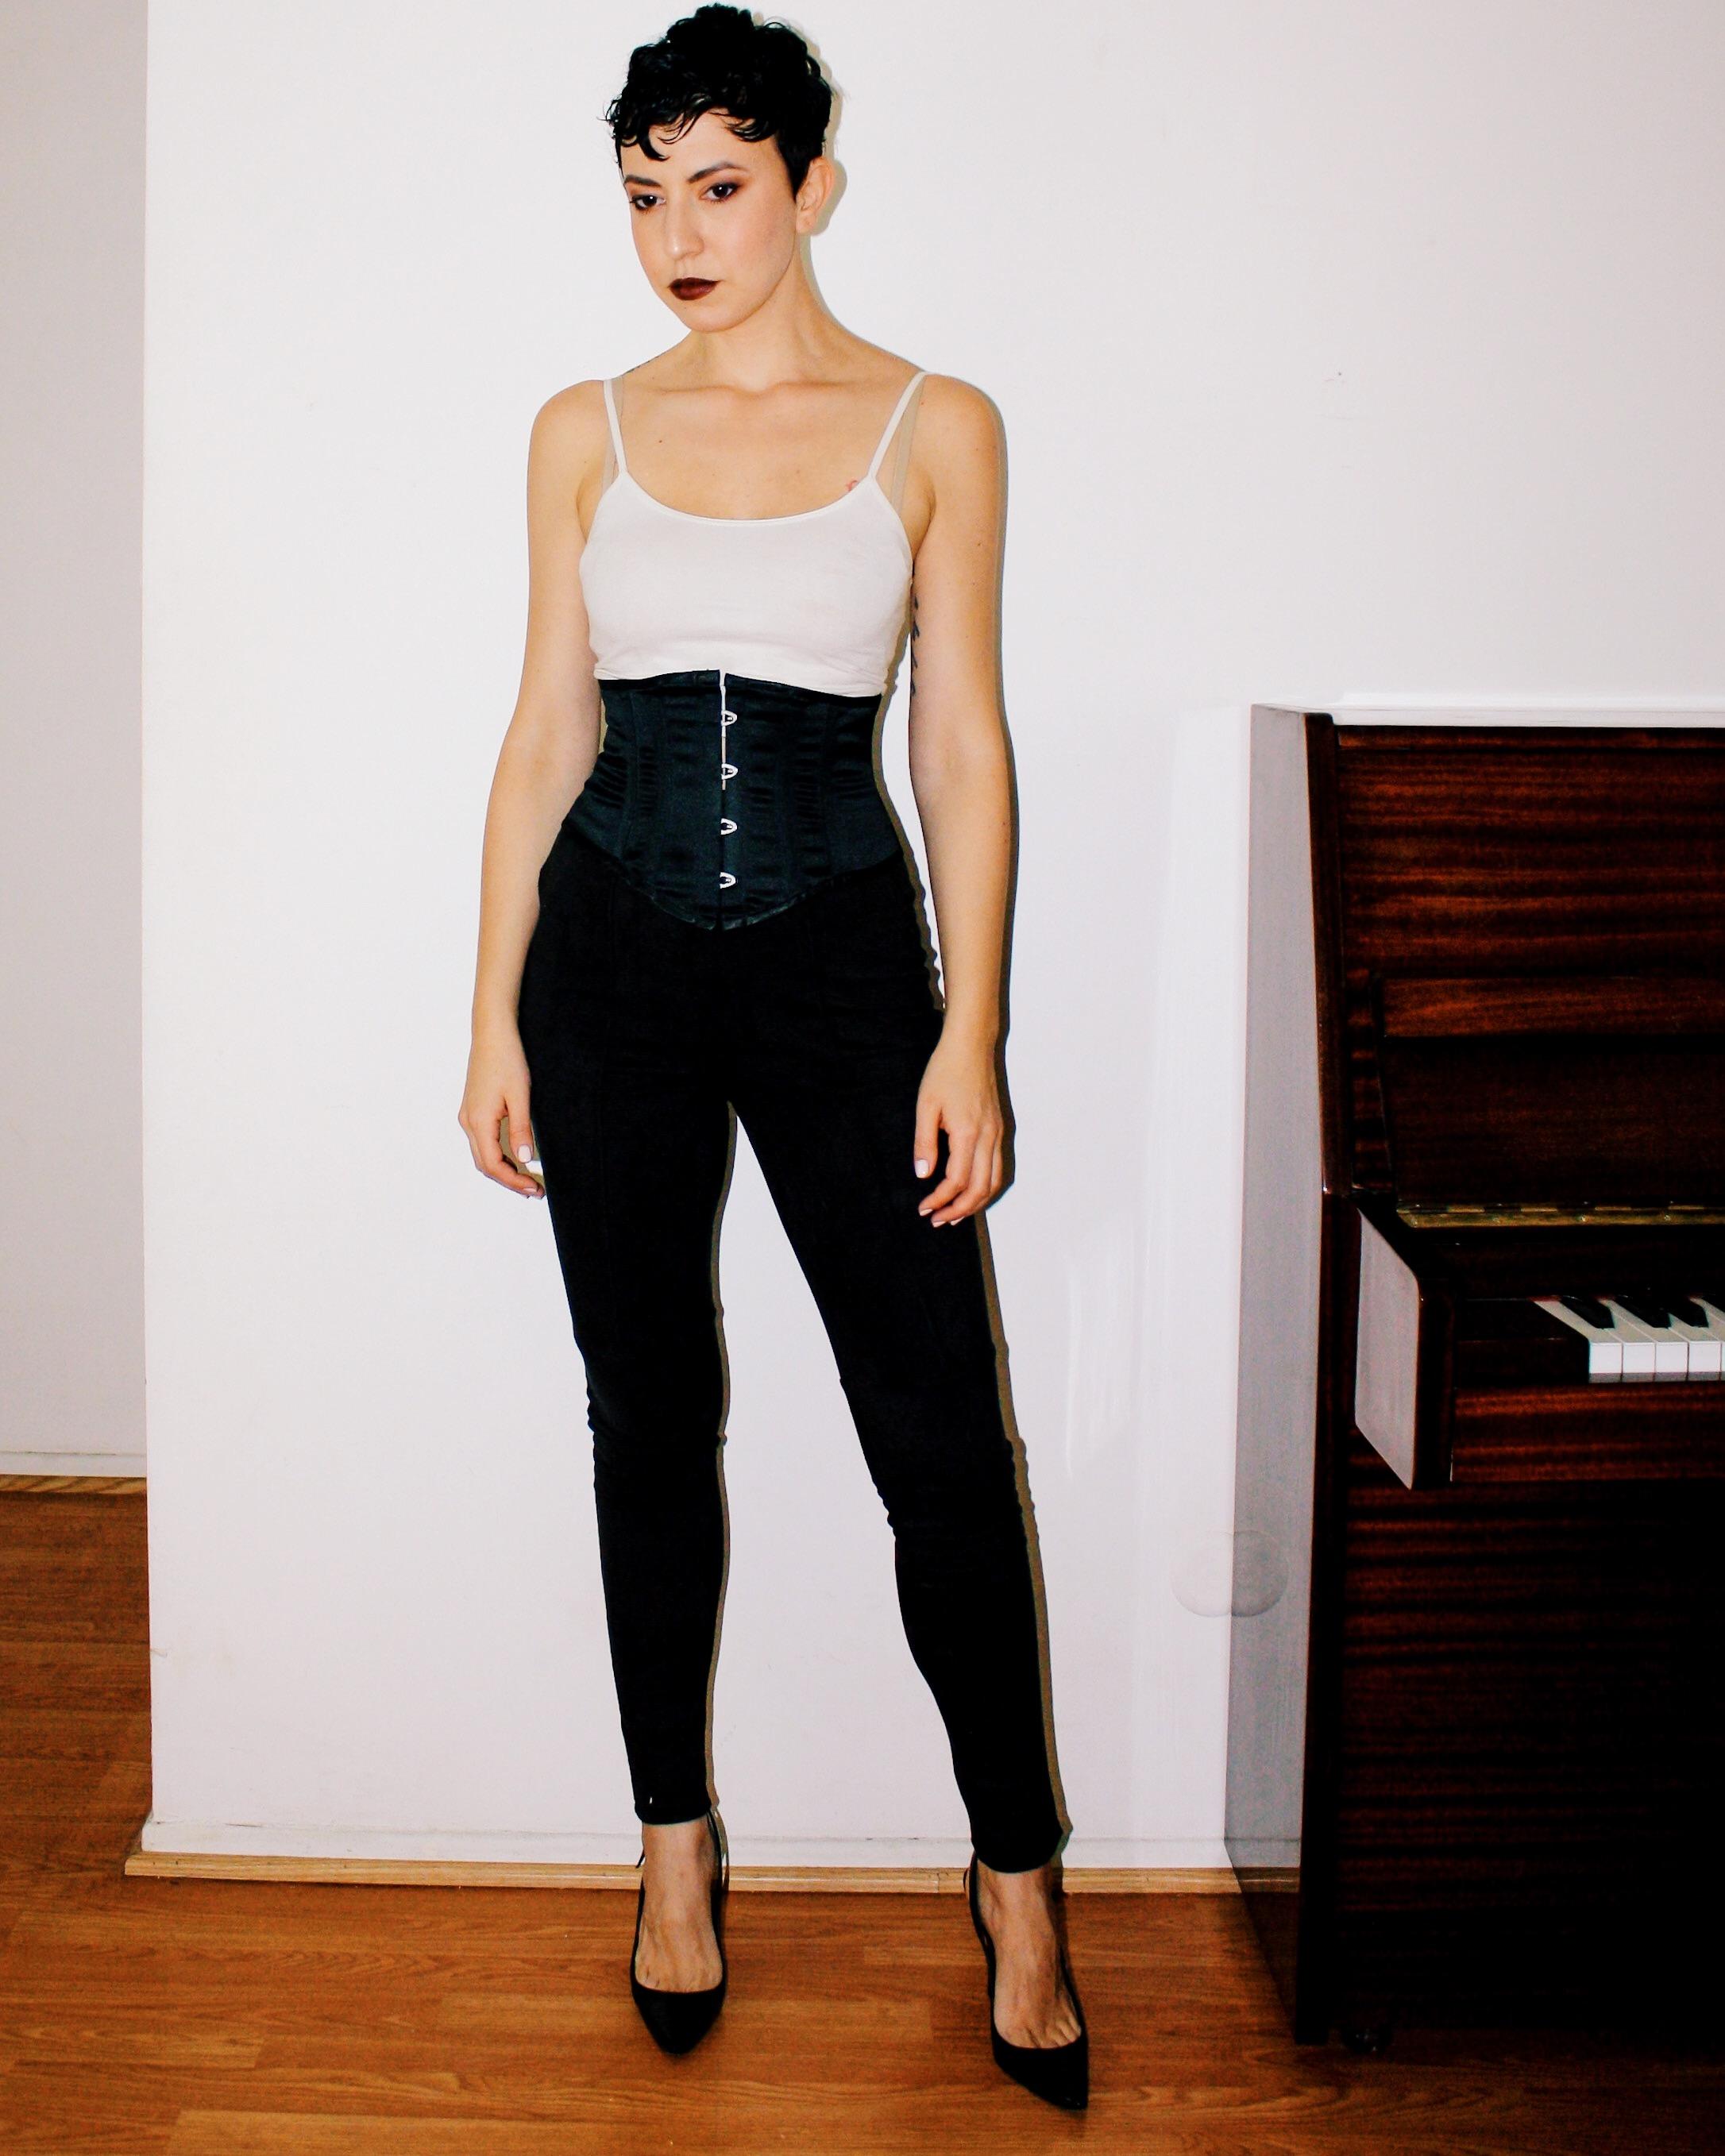 casual outfits manolo blahnik patent leather heels shoes suede pants piano white tank fur stole jacket corset belt 3